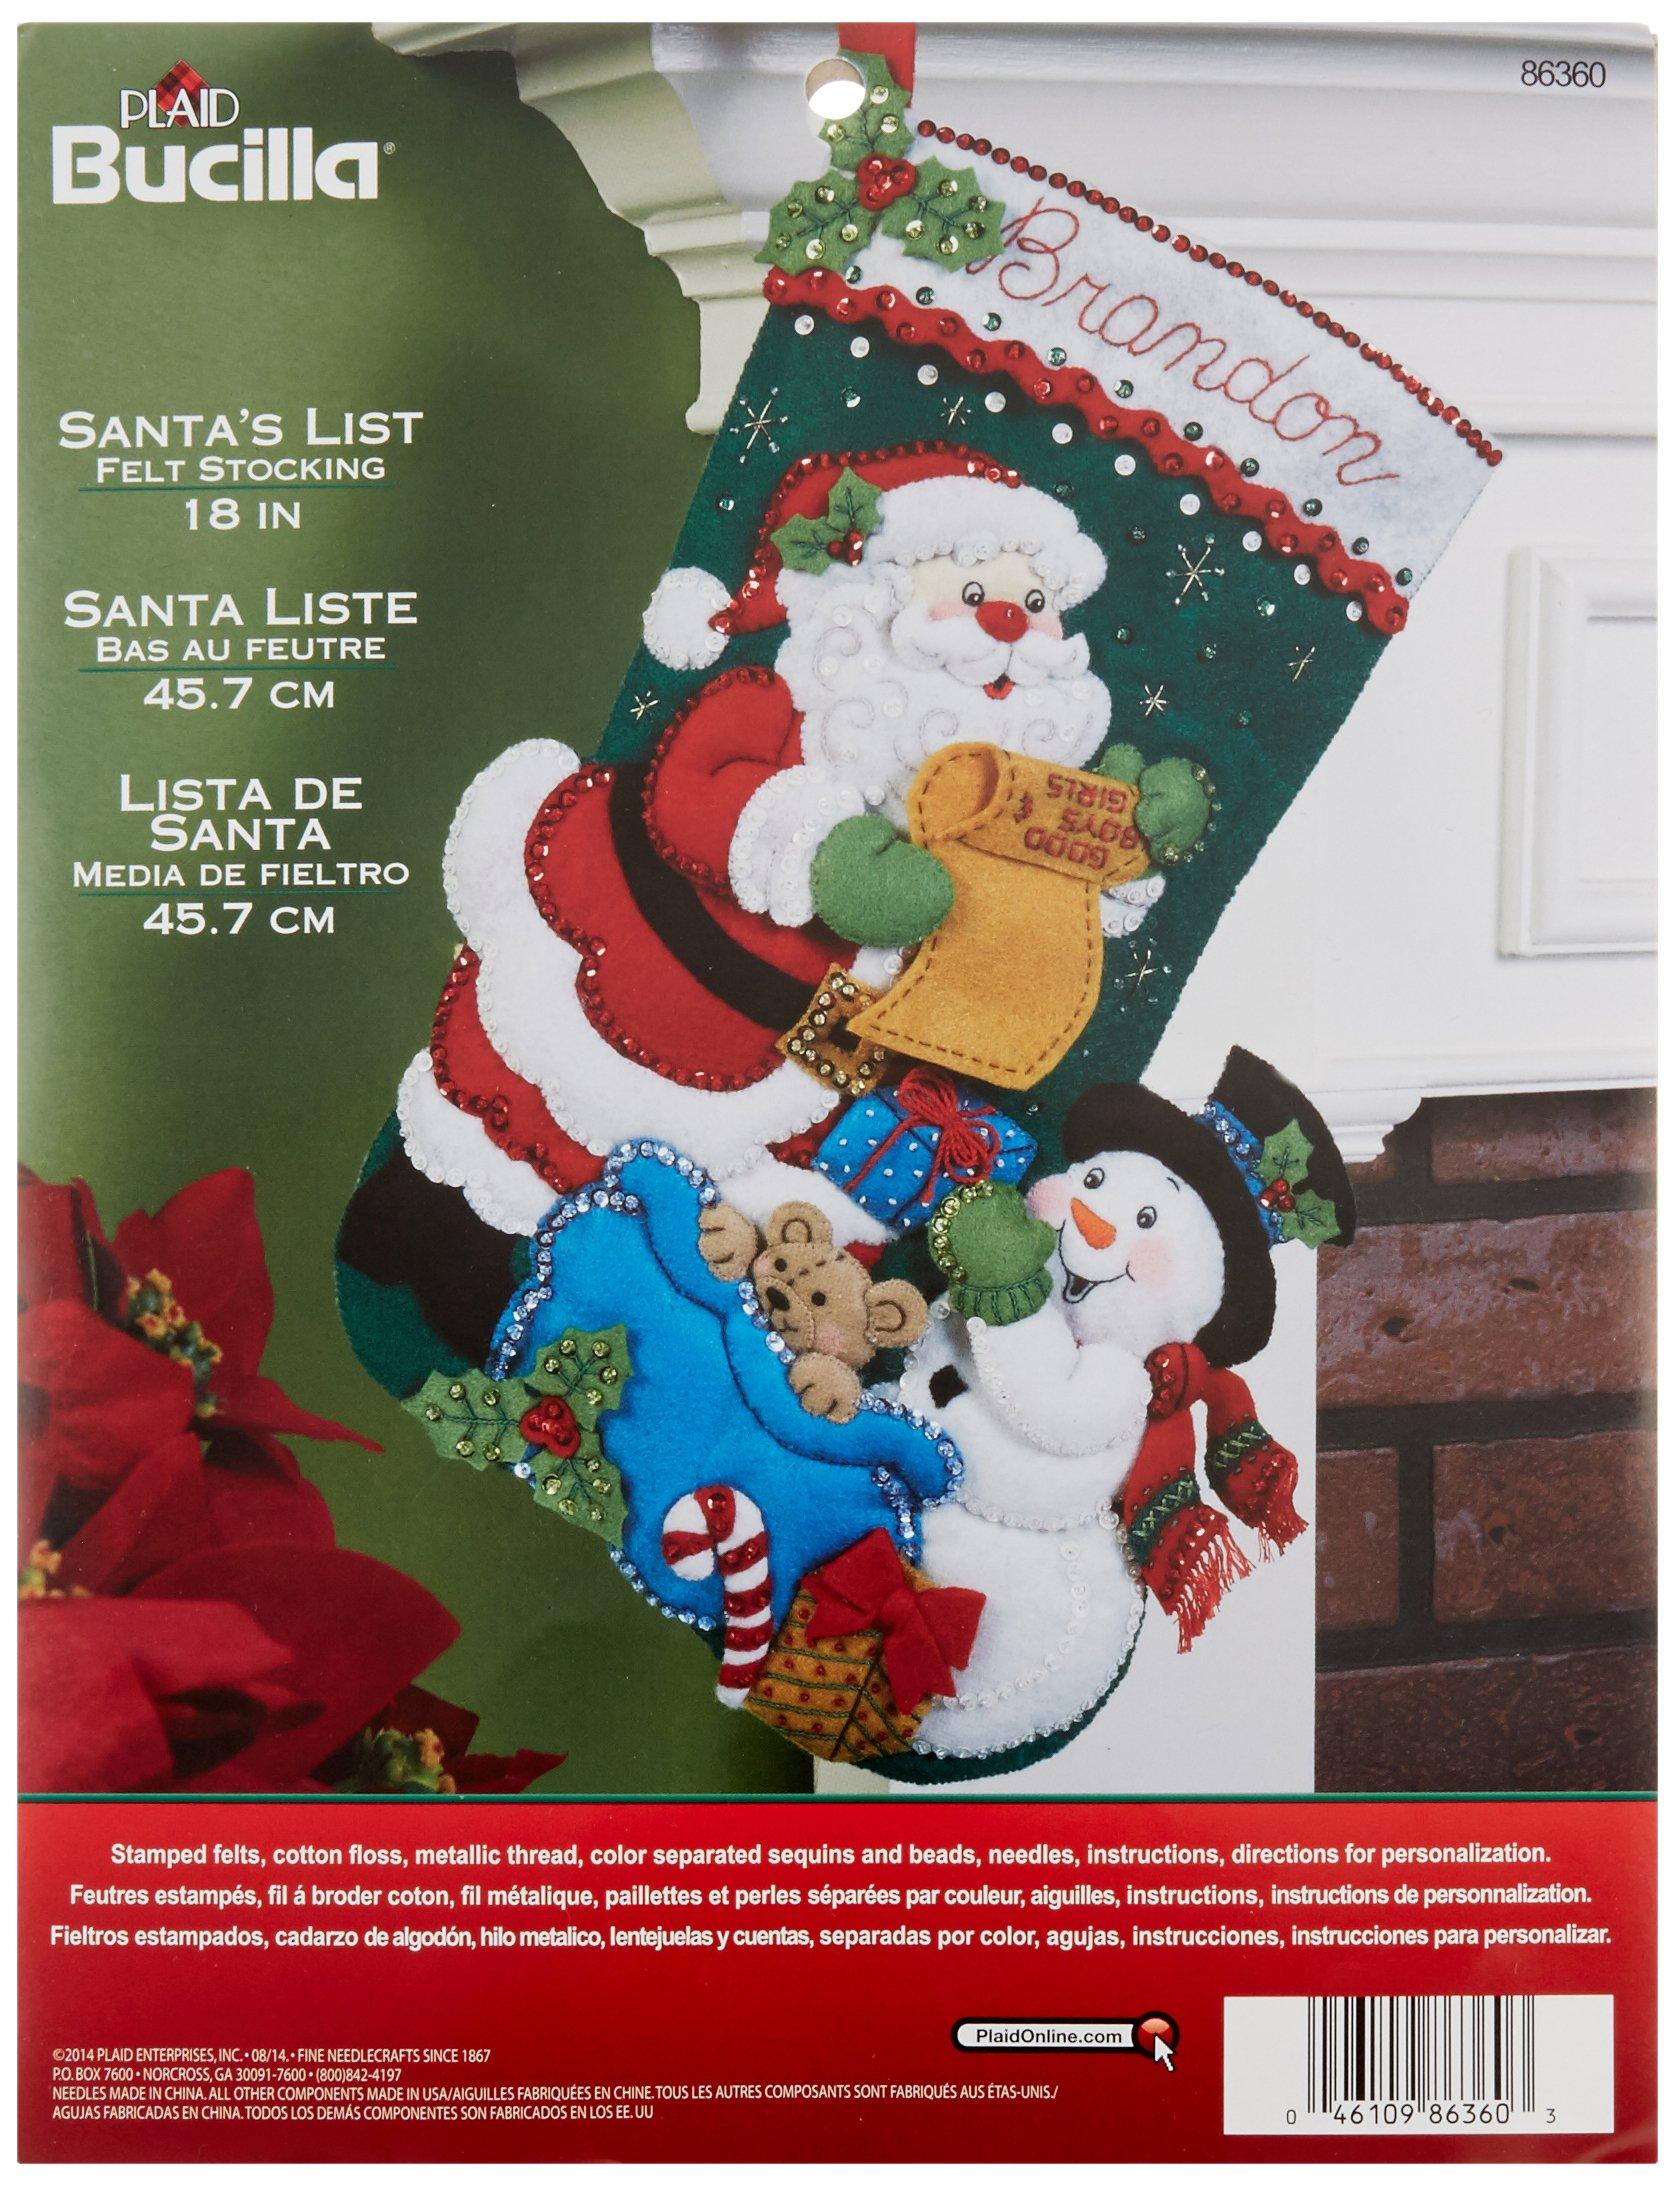 Bucilla 18-Inch Christmas Stocking Felt Applique Kit, 86360 Santas List product image